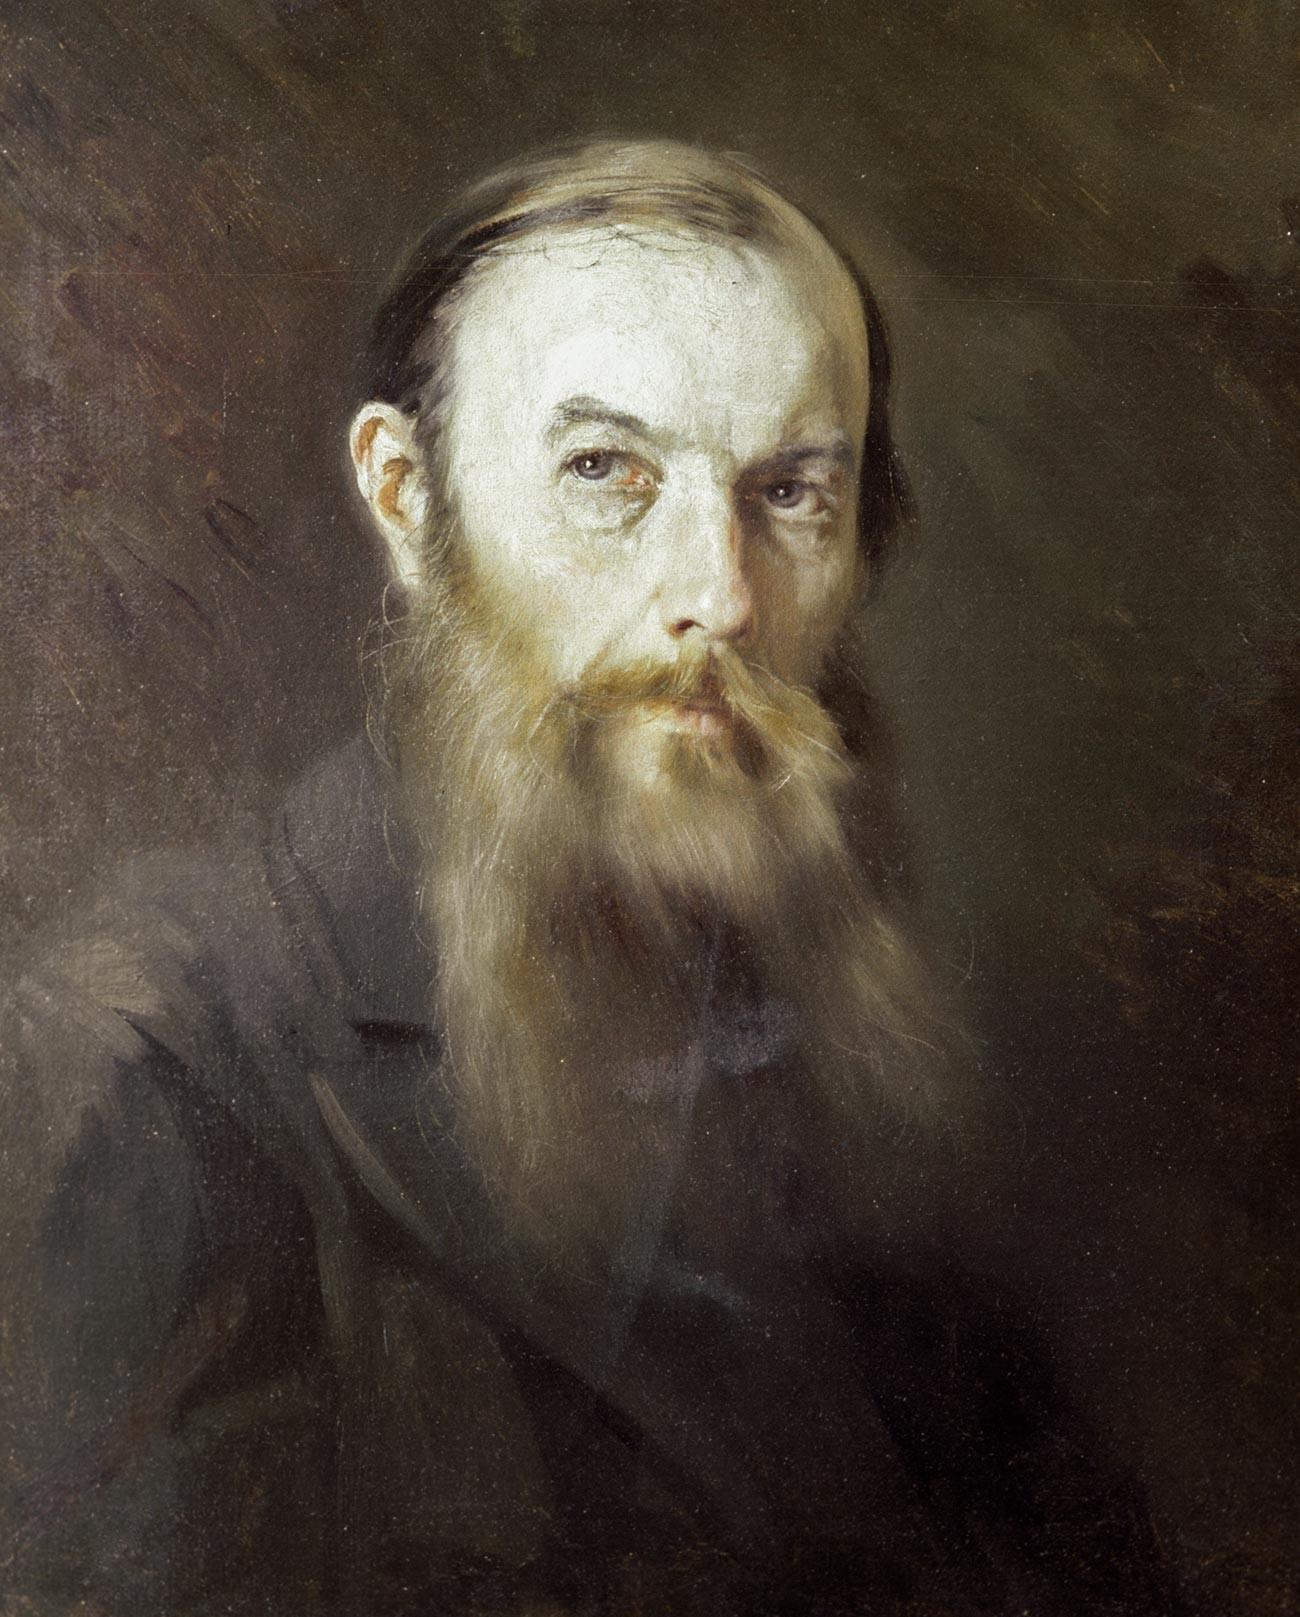 Reprodukcija slike M. Ščerbatova iz kolekcije muzeja F. Dostojevskog